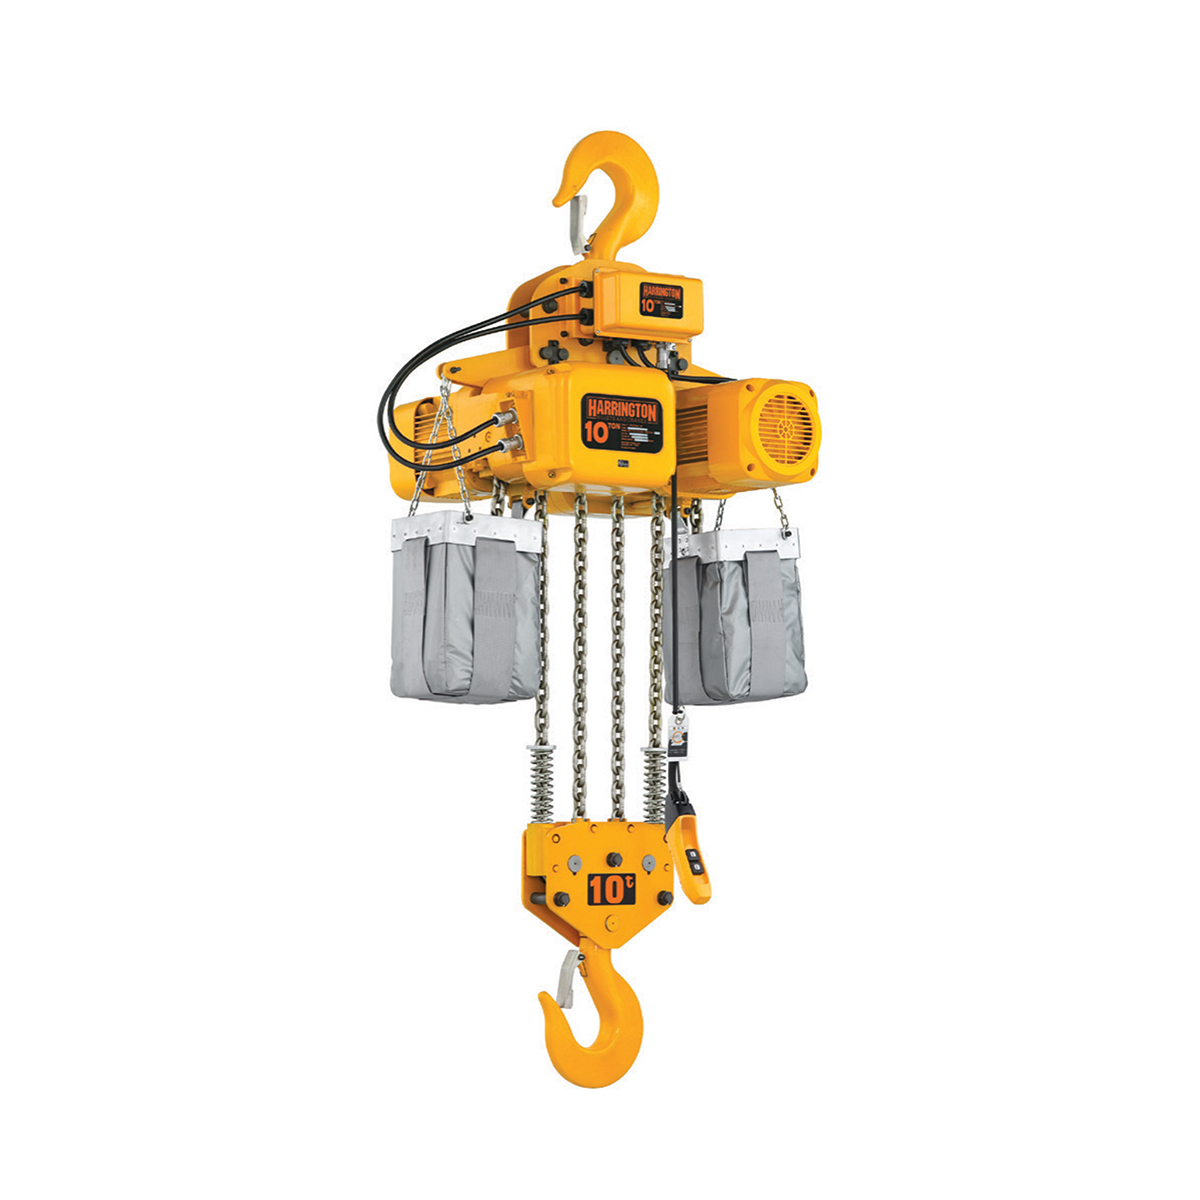 Harrington NER/ER 3-Phase Large Capacity Electric Chain Hoist